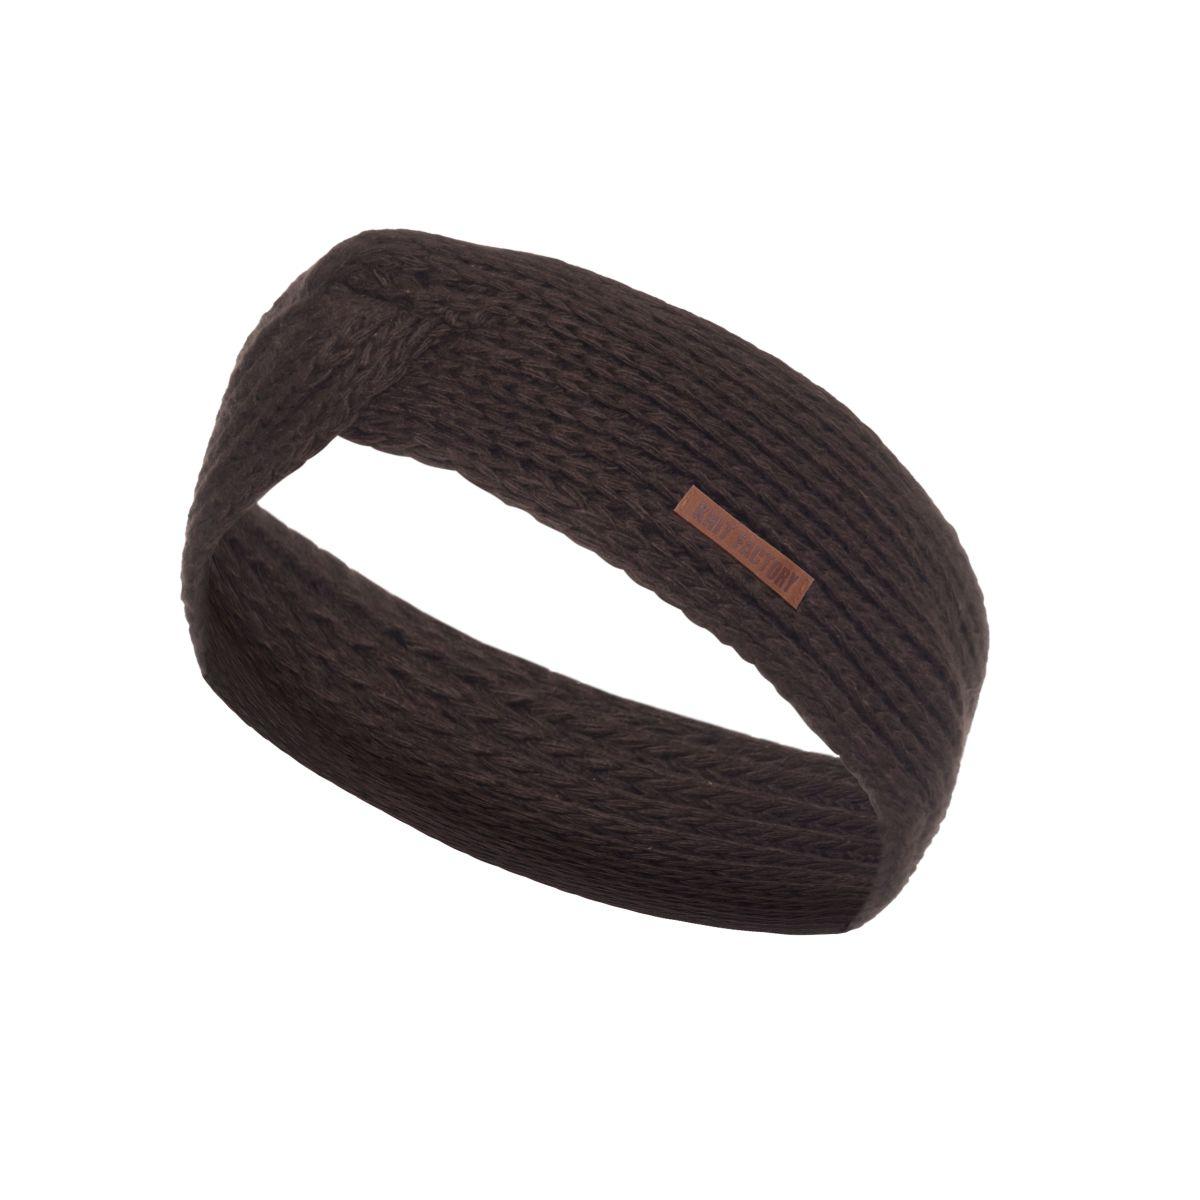 knit factory kf13706903750 joy hoofdband donkerbruin 1